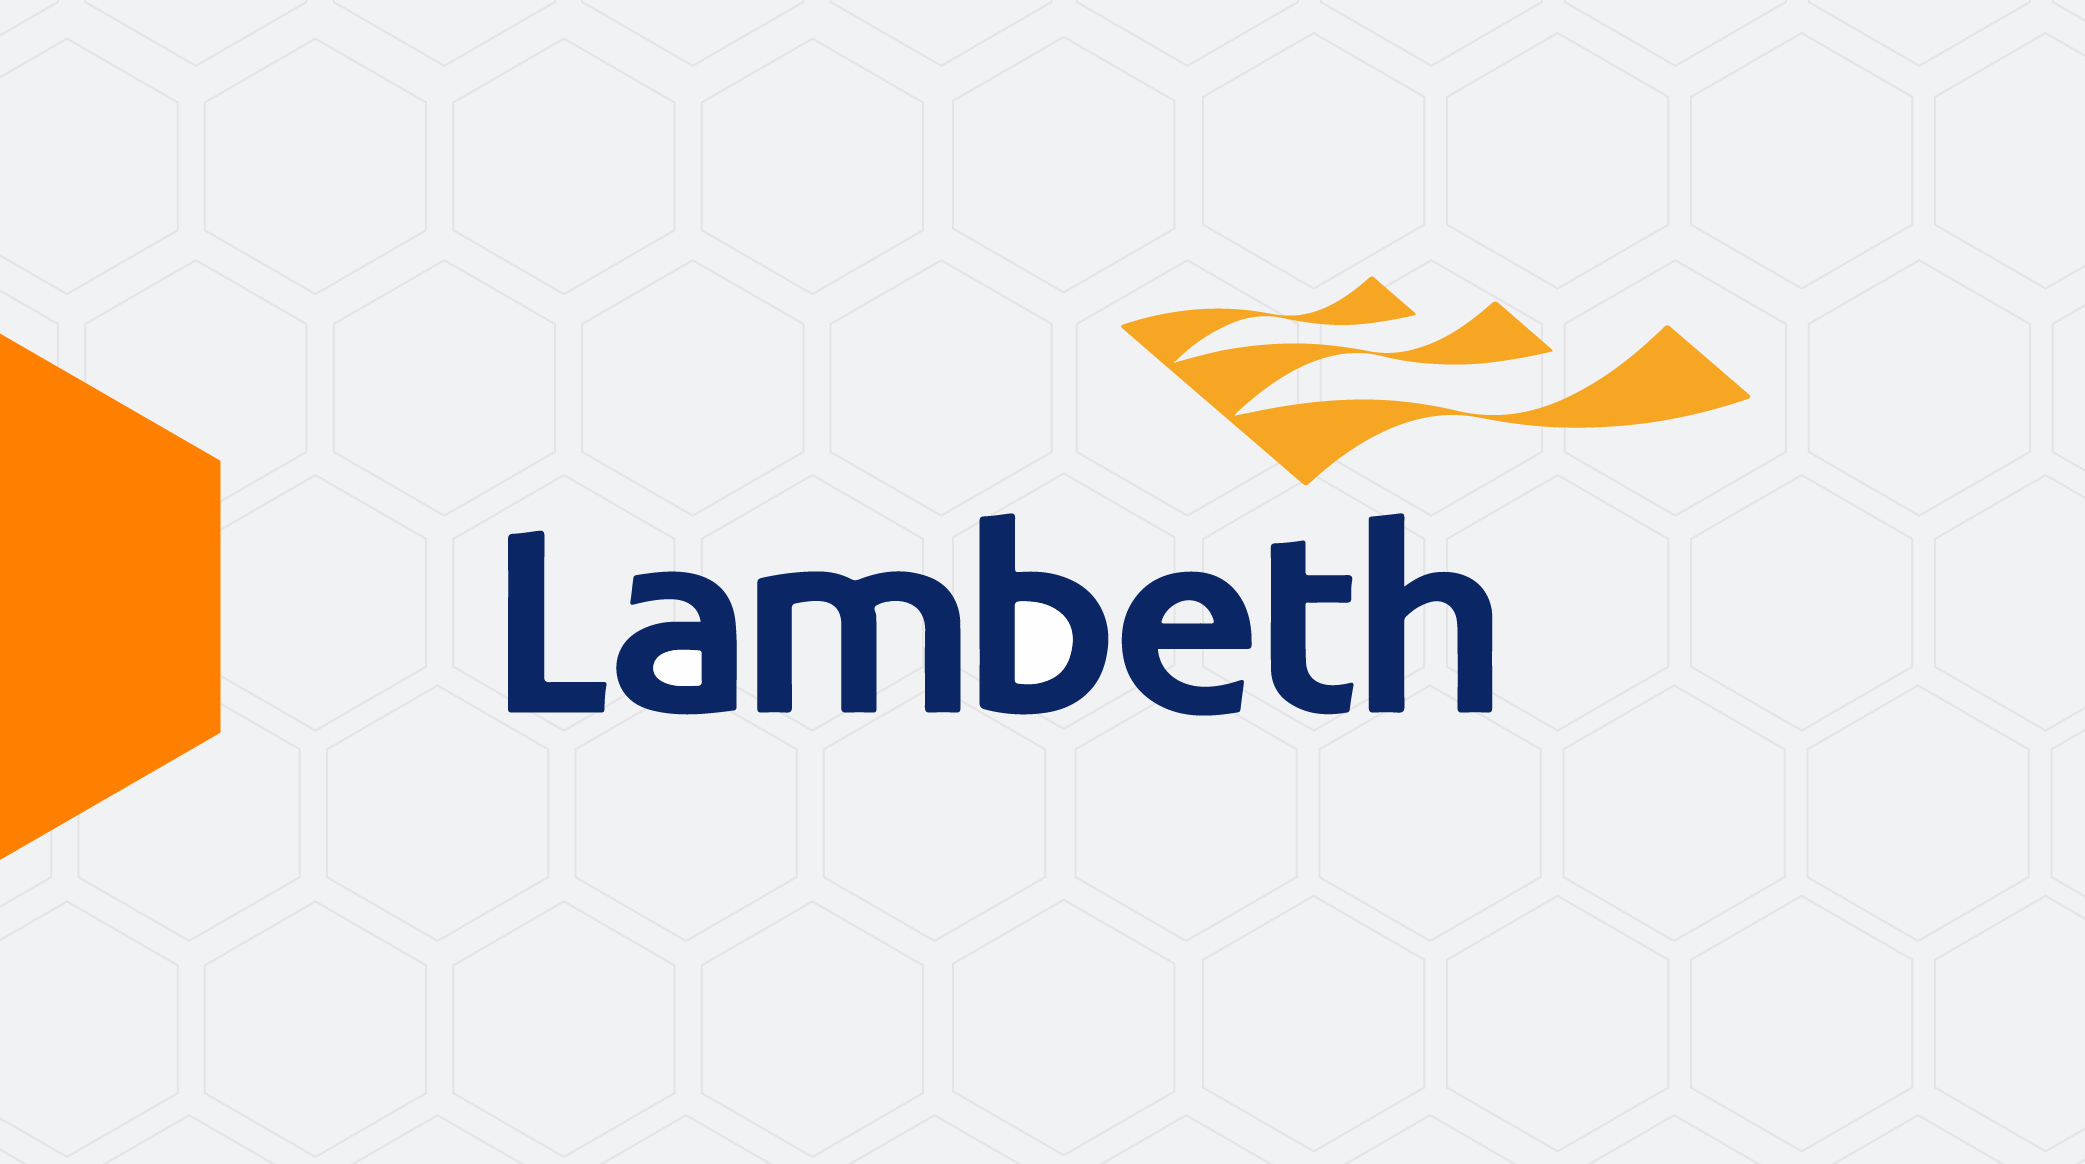 Lambeth Council recognised as a trailblazer in post-COVID adaption with Unacast's uniquely granular, comparative location data